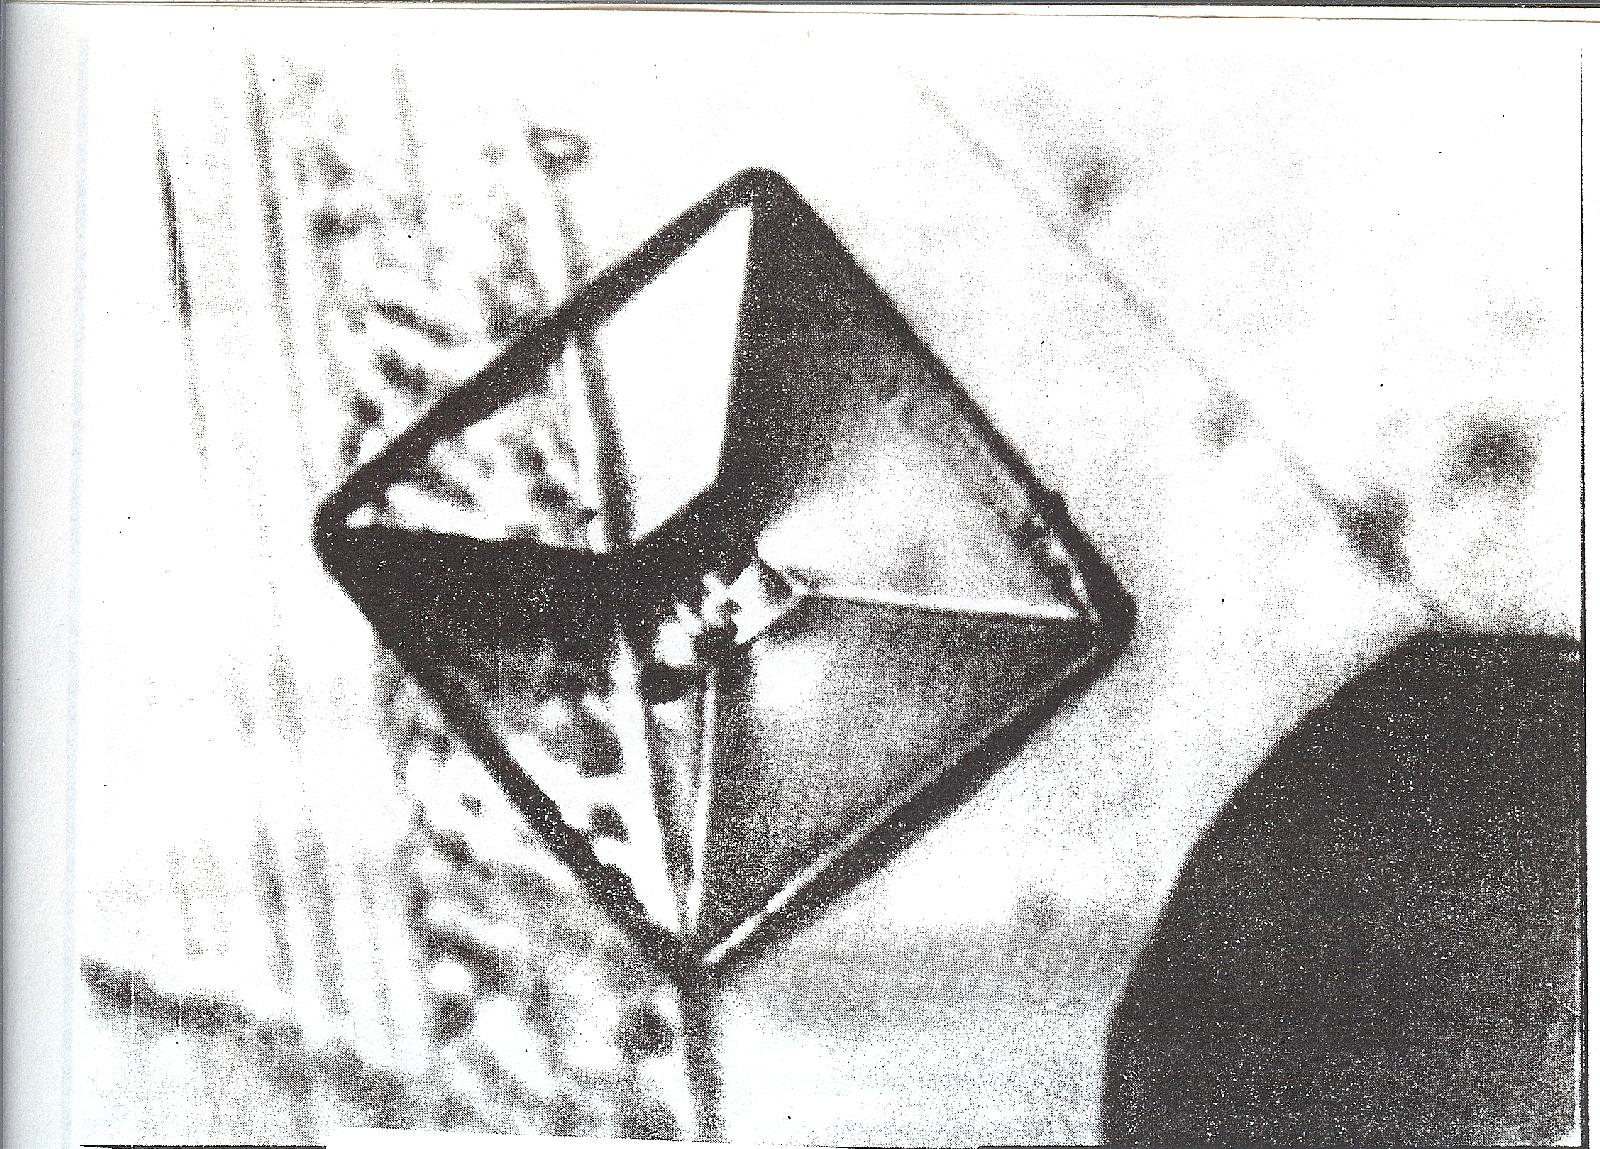 [Image: pyramid-topview-lg-plate.jpg]